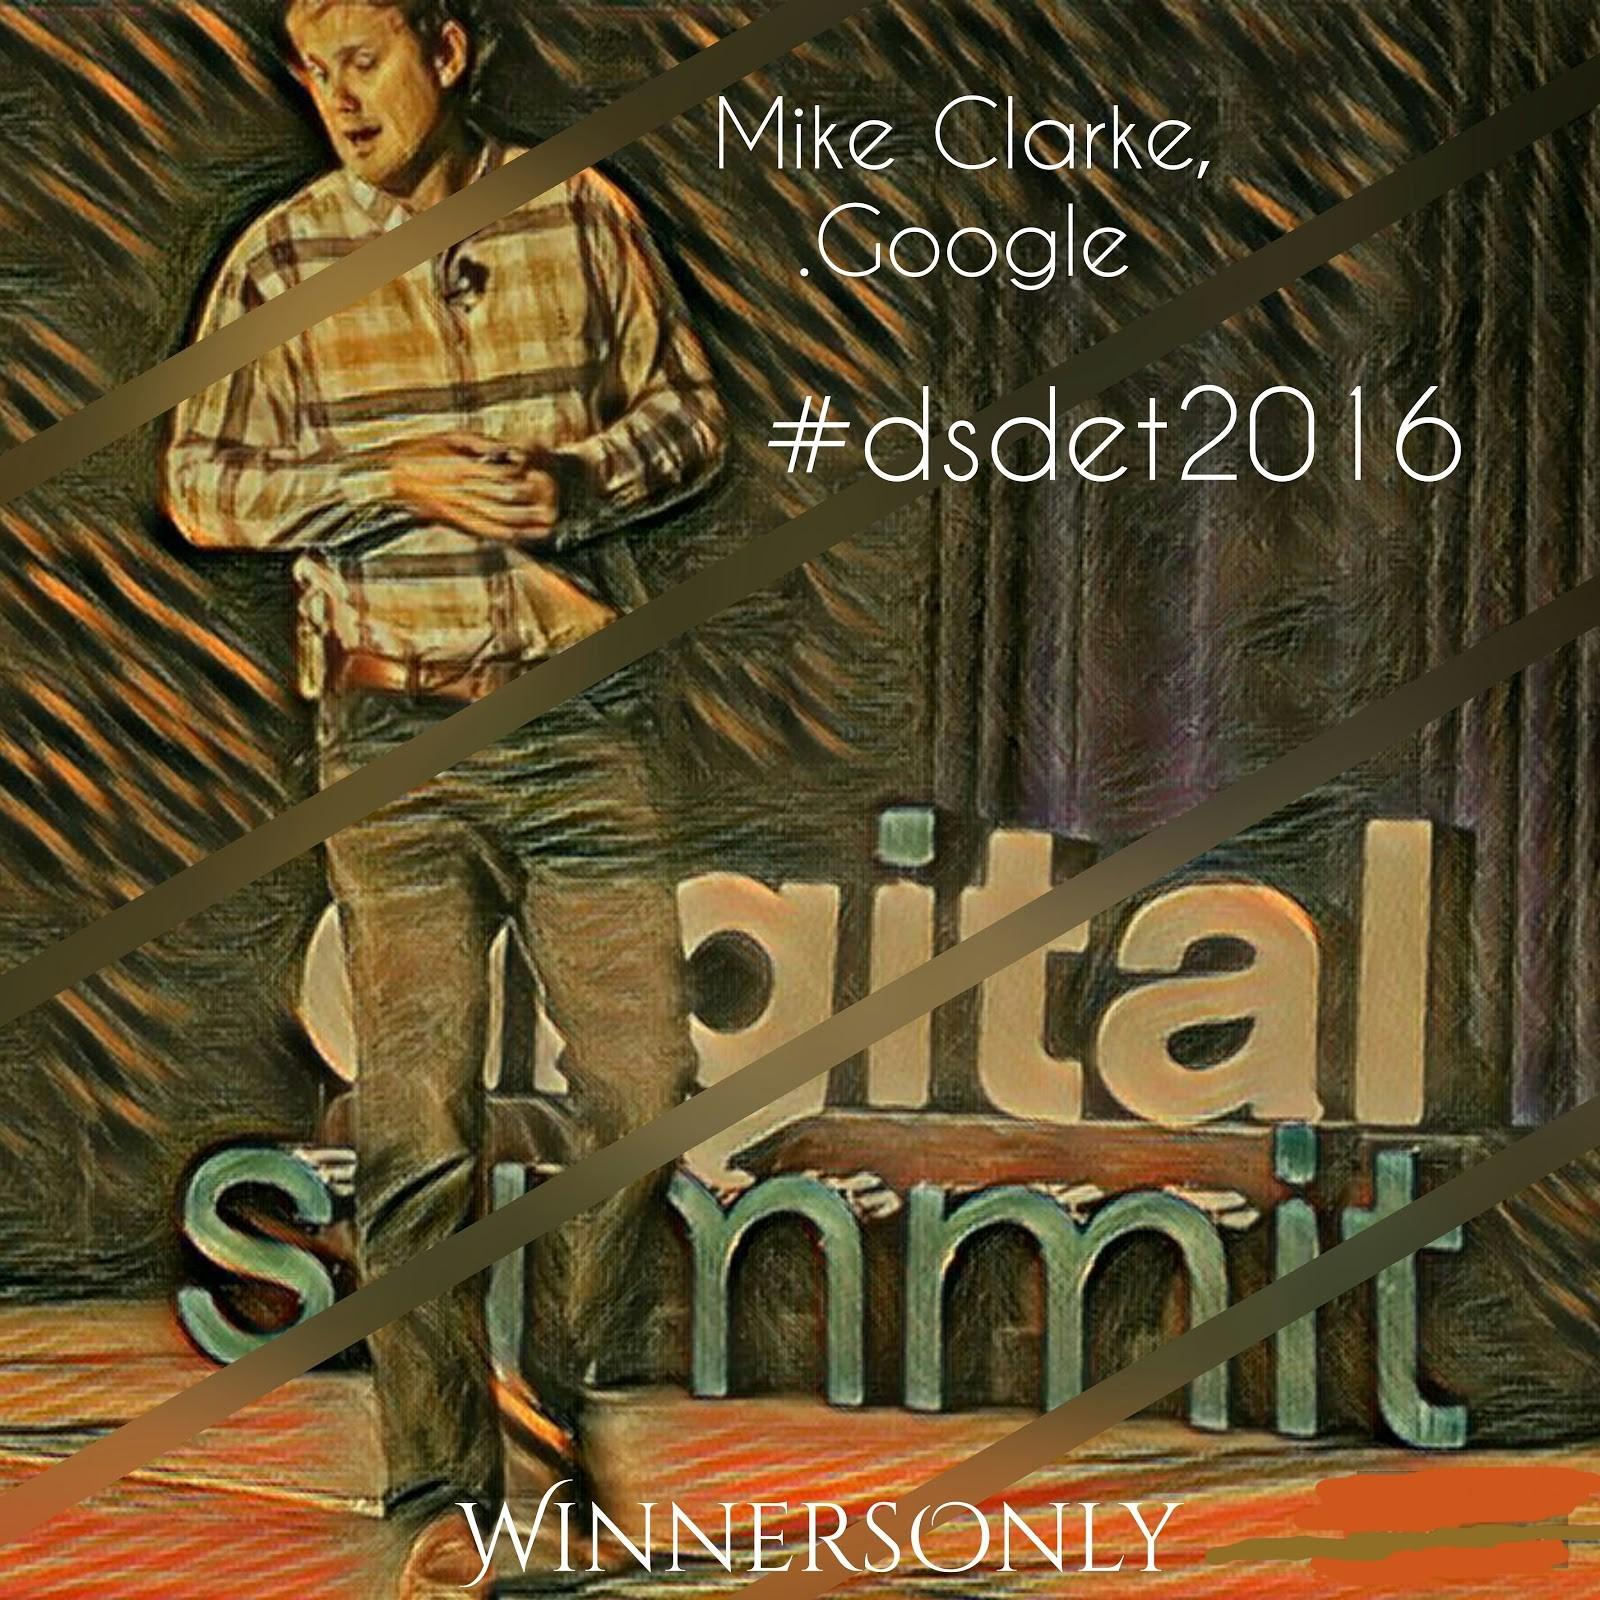 mike clarke detroit digital summit.jpg